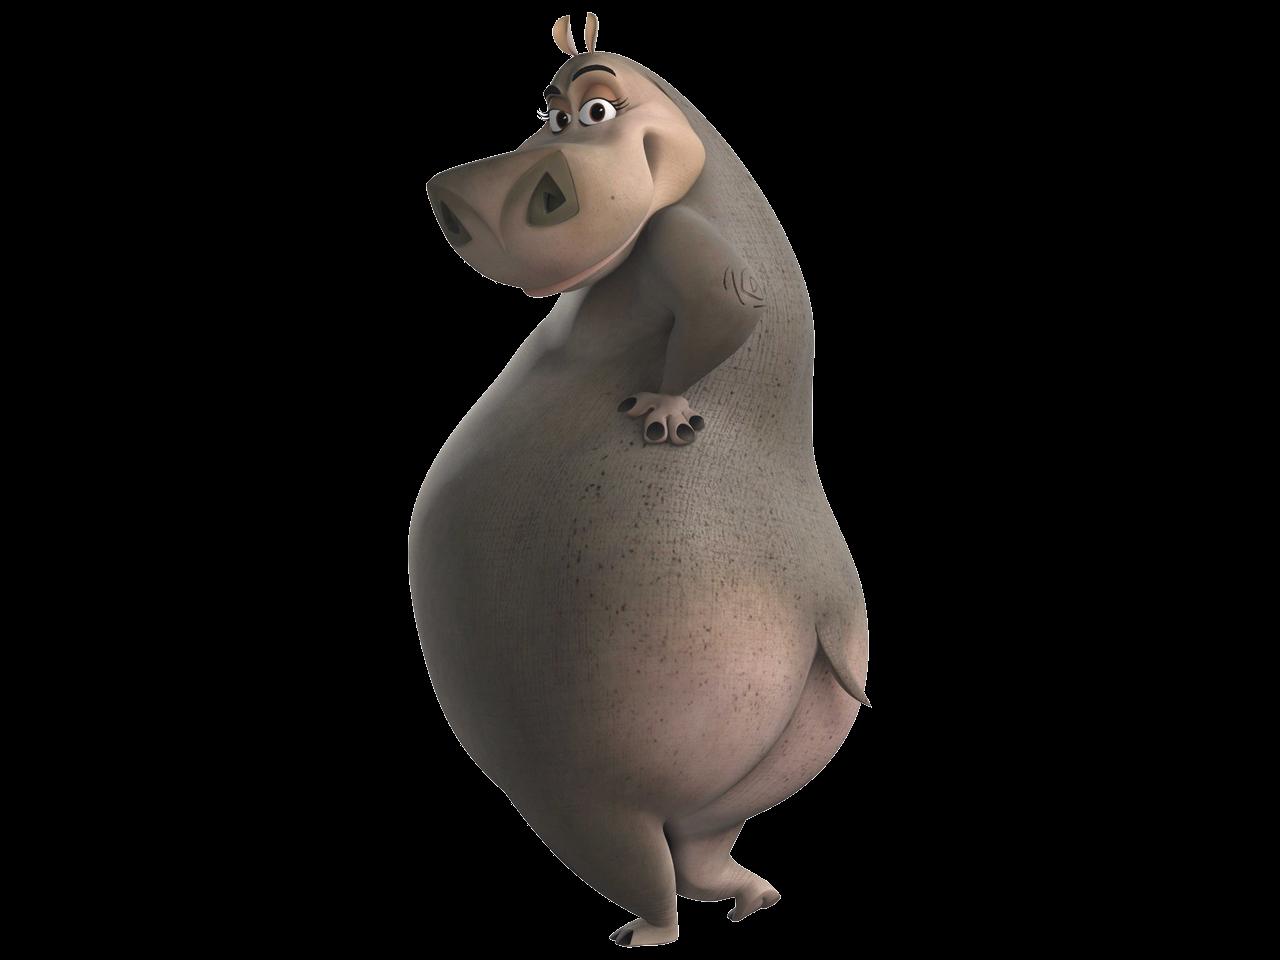 Madagascar 2 Cartoon Characters : Cartoon characters madagascar and shrek png